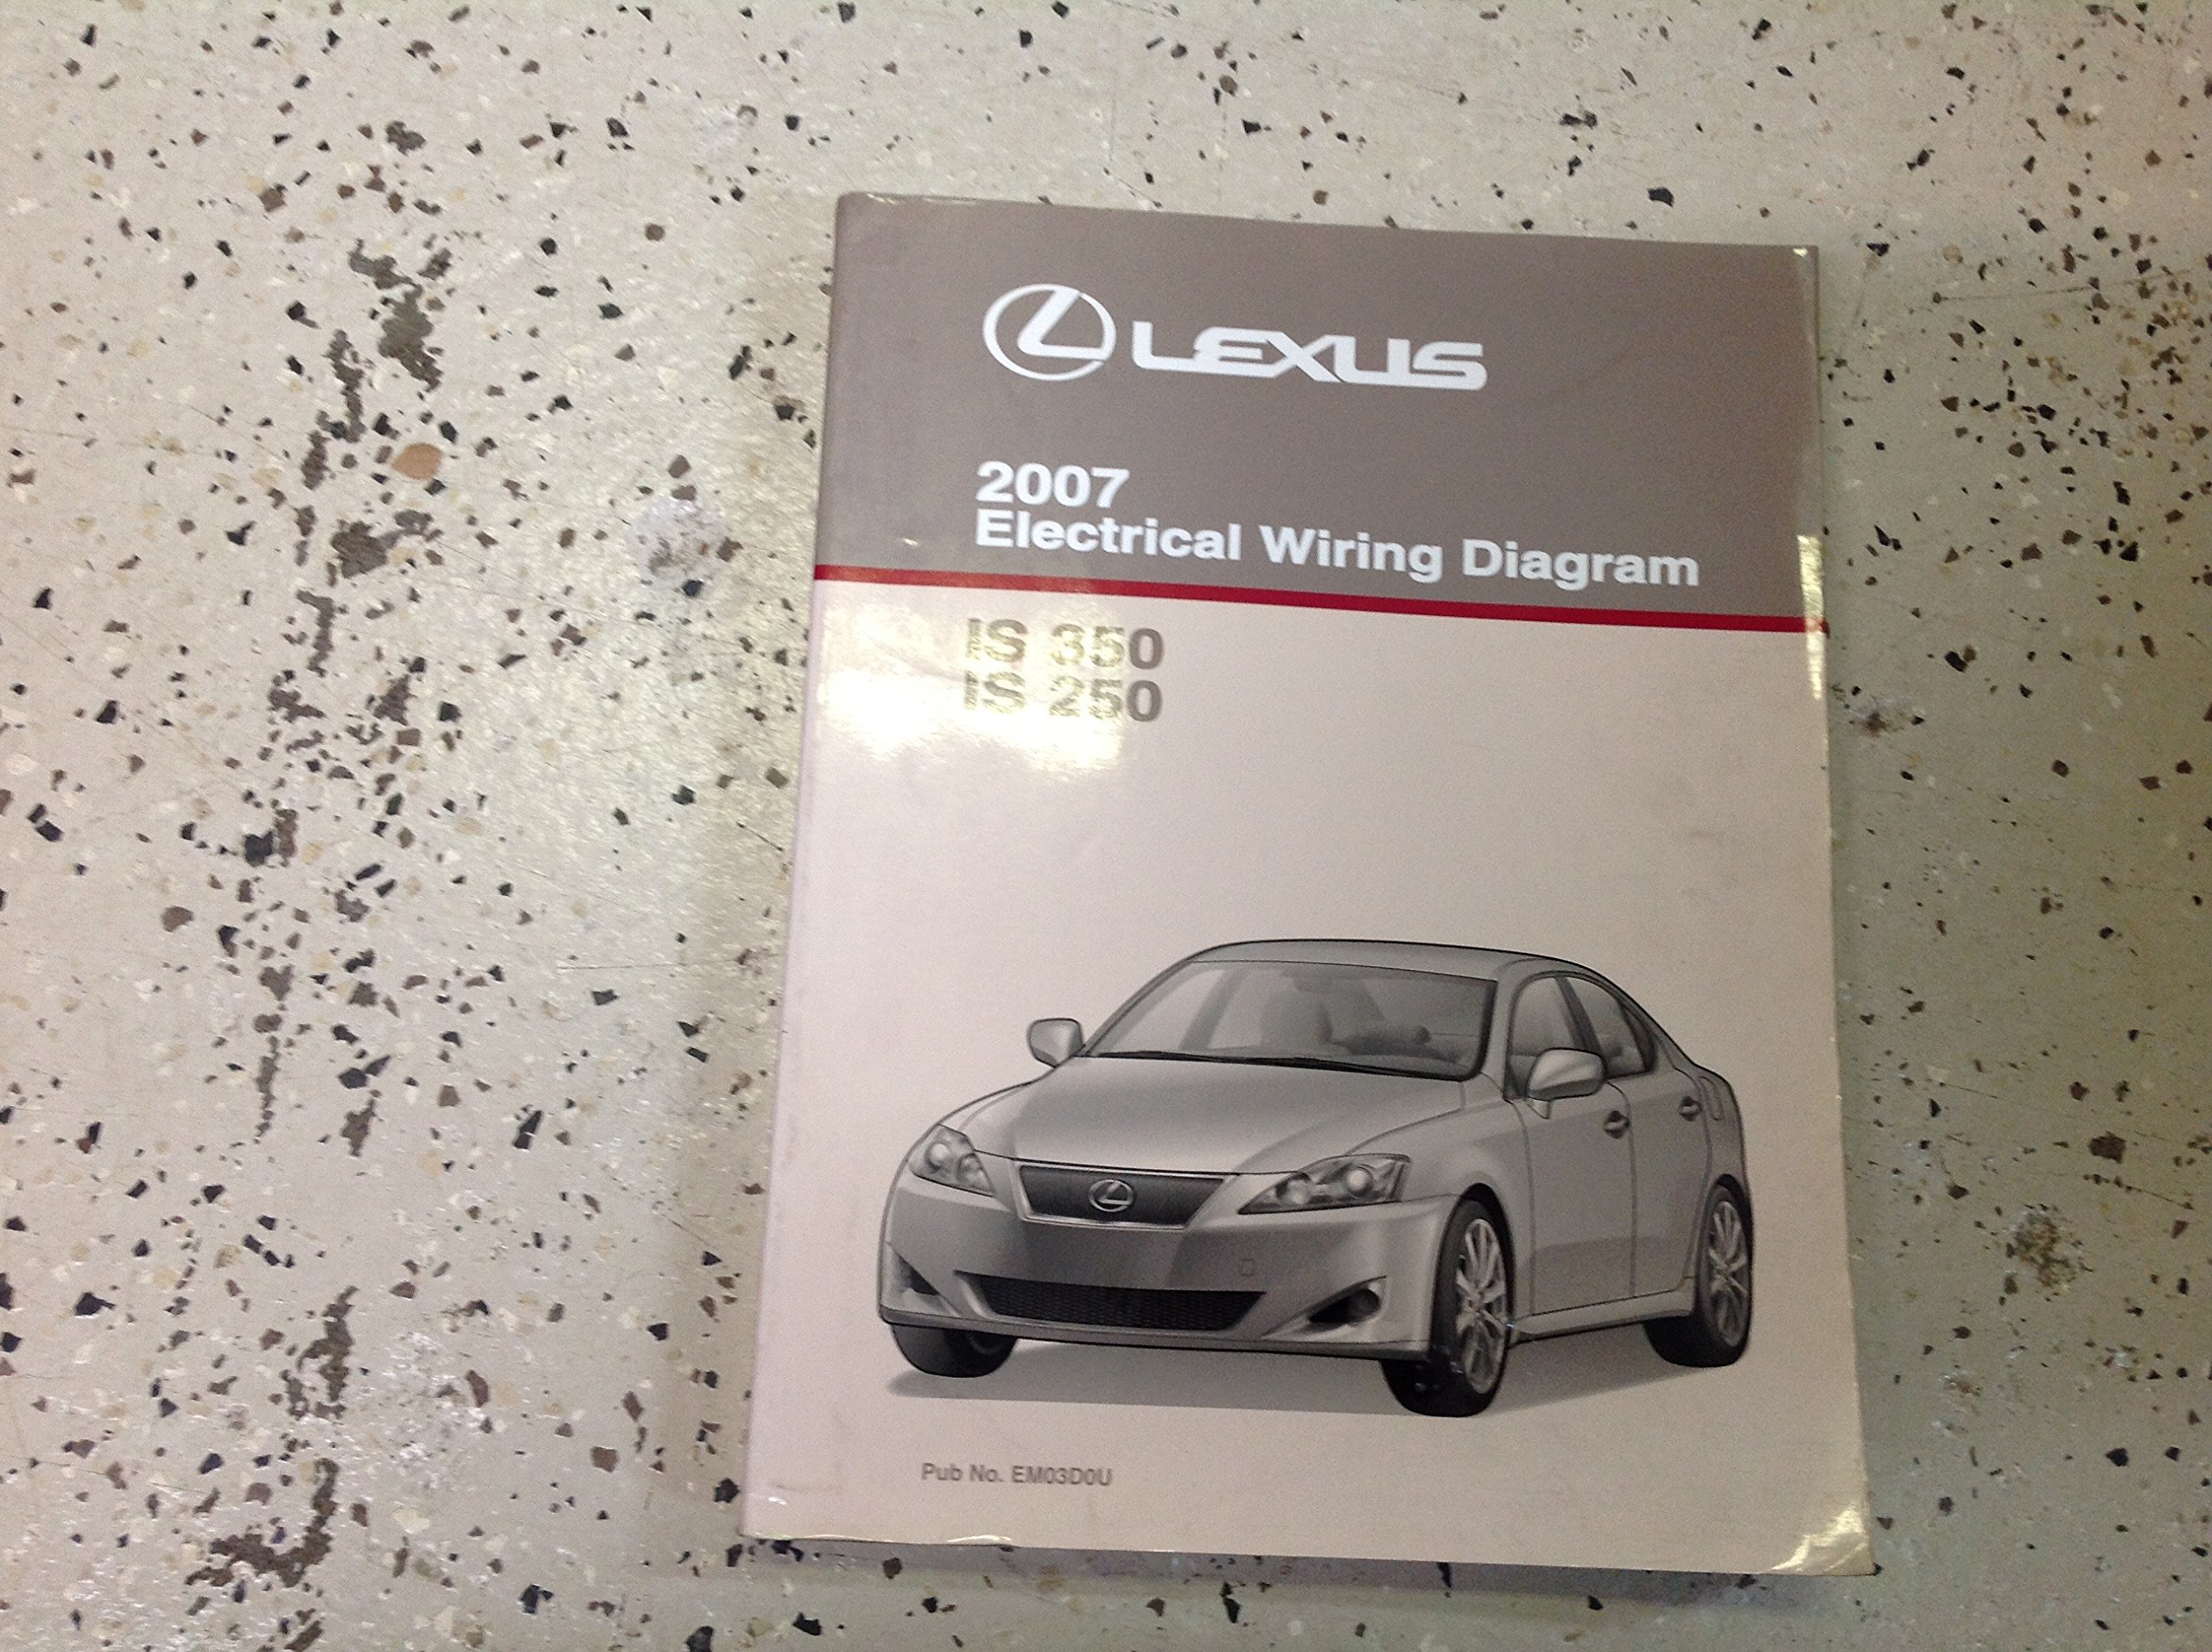 2007 Lexus Is350 Is 350 250 Is250 Electrical Wiring Diagram Shop Manual Ewd Books